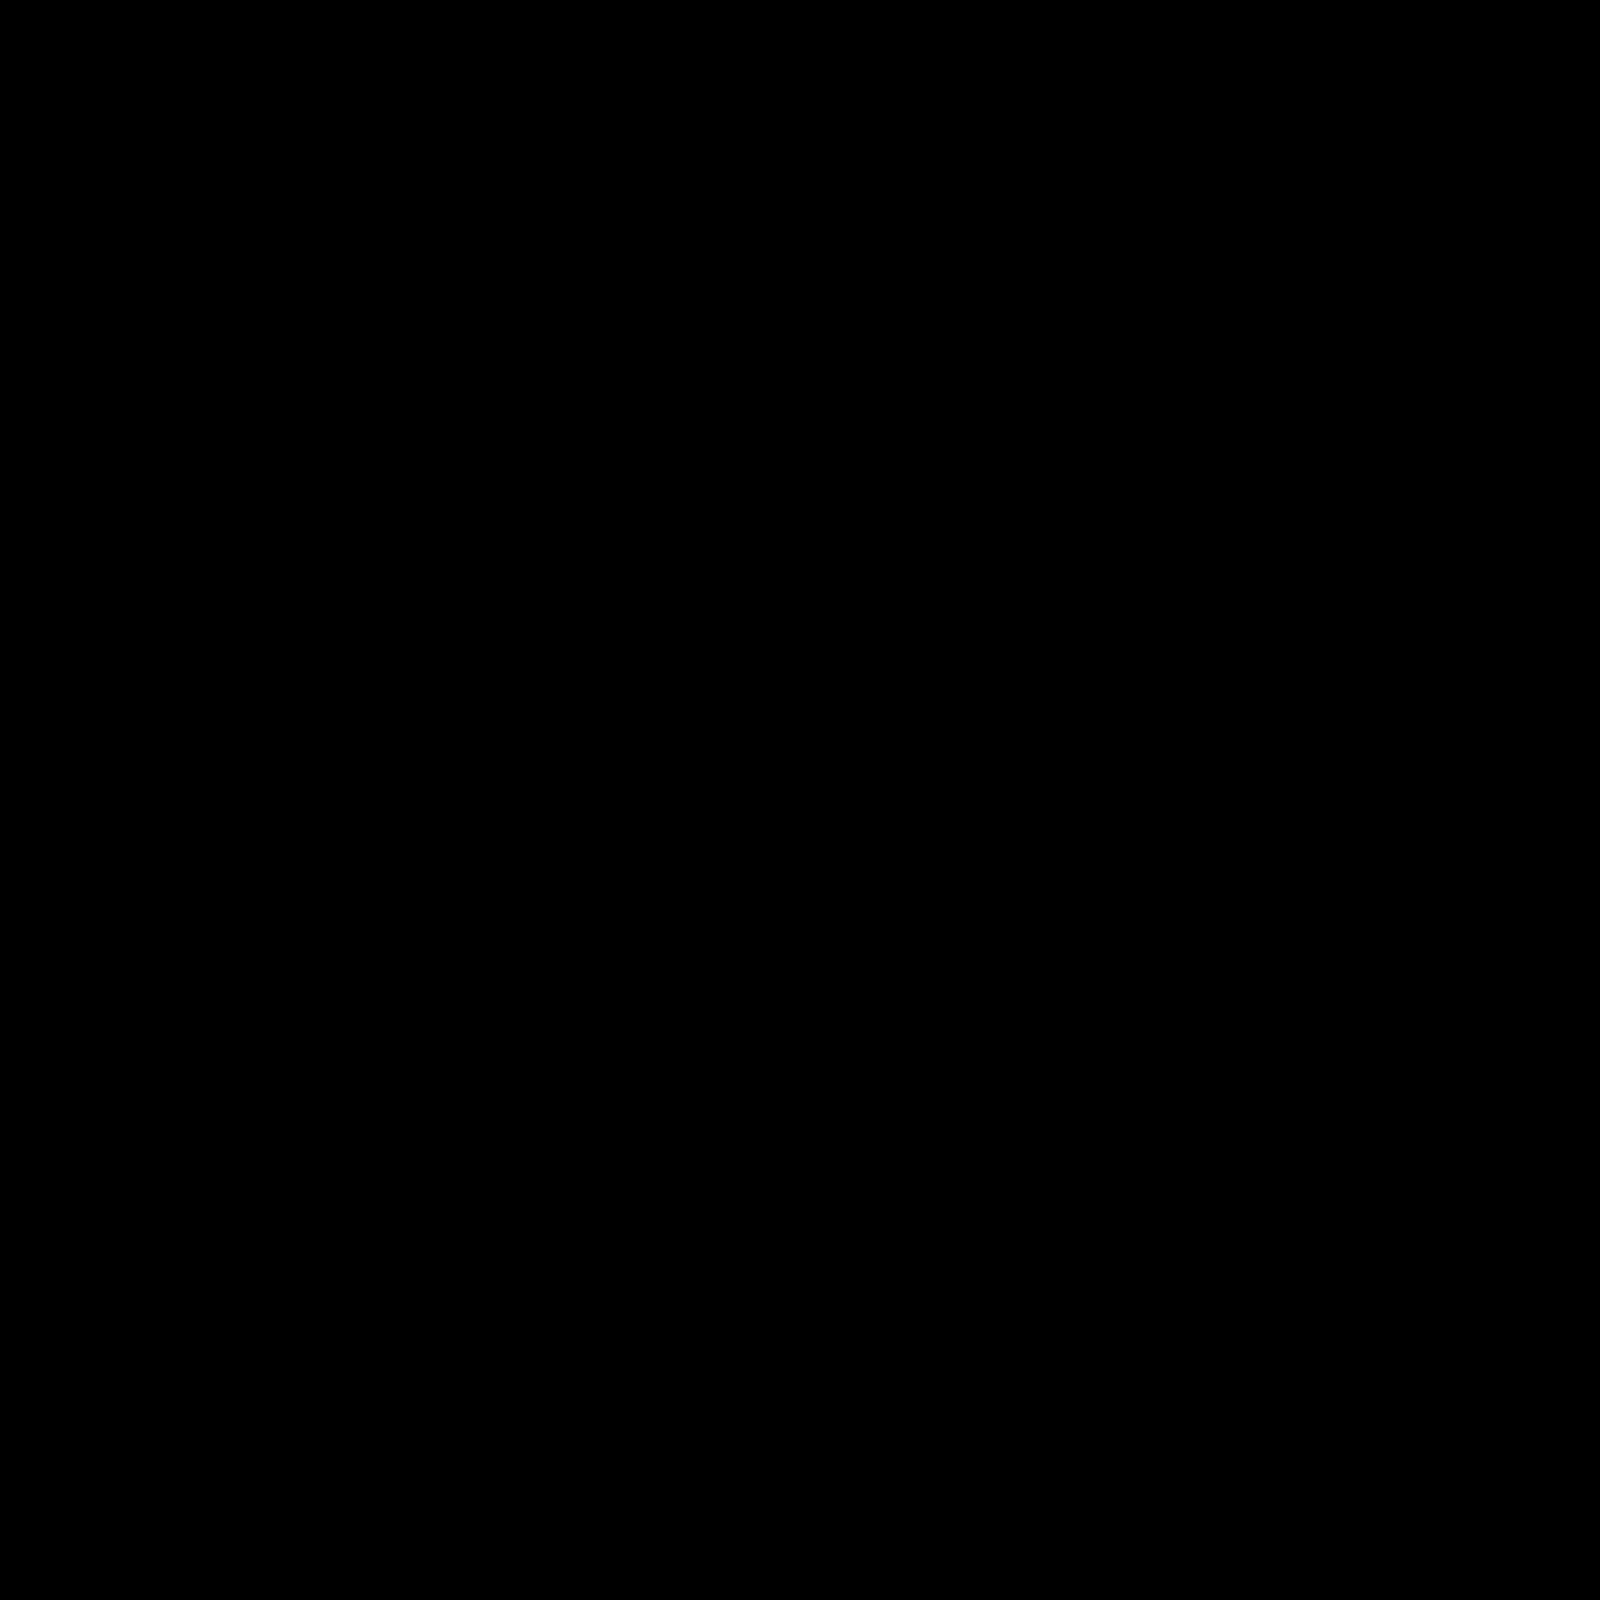 Manual Metal Arc Welding icon - Welding PNG HD Free